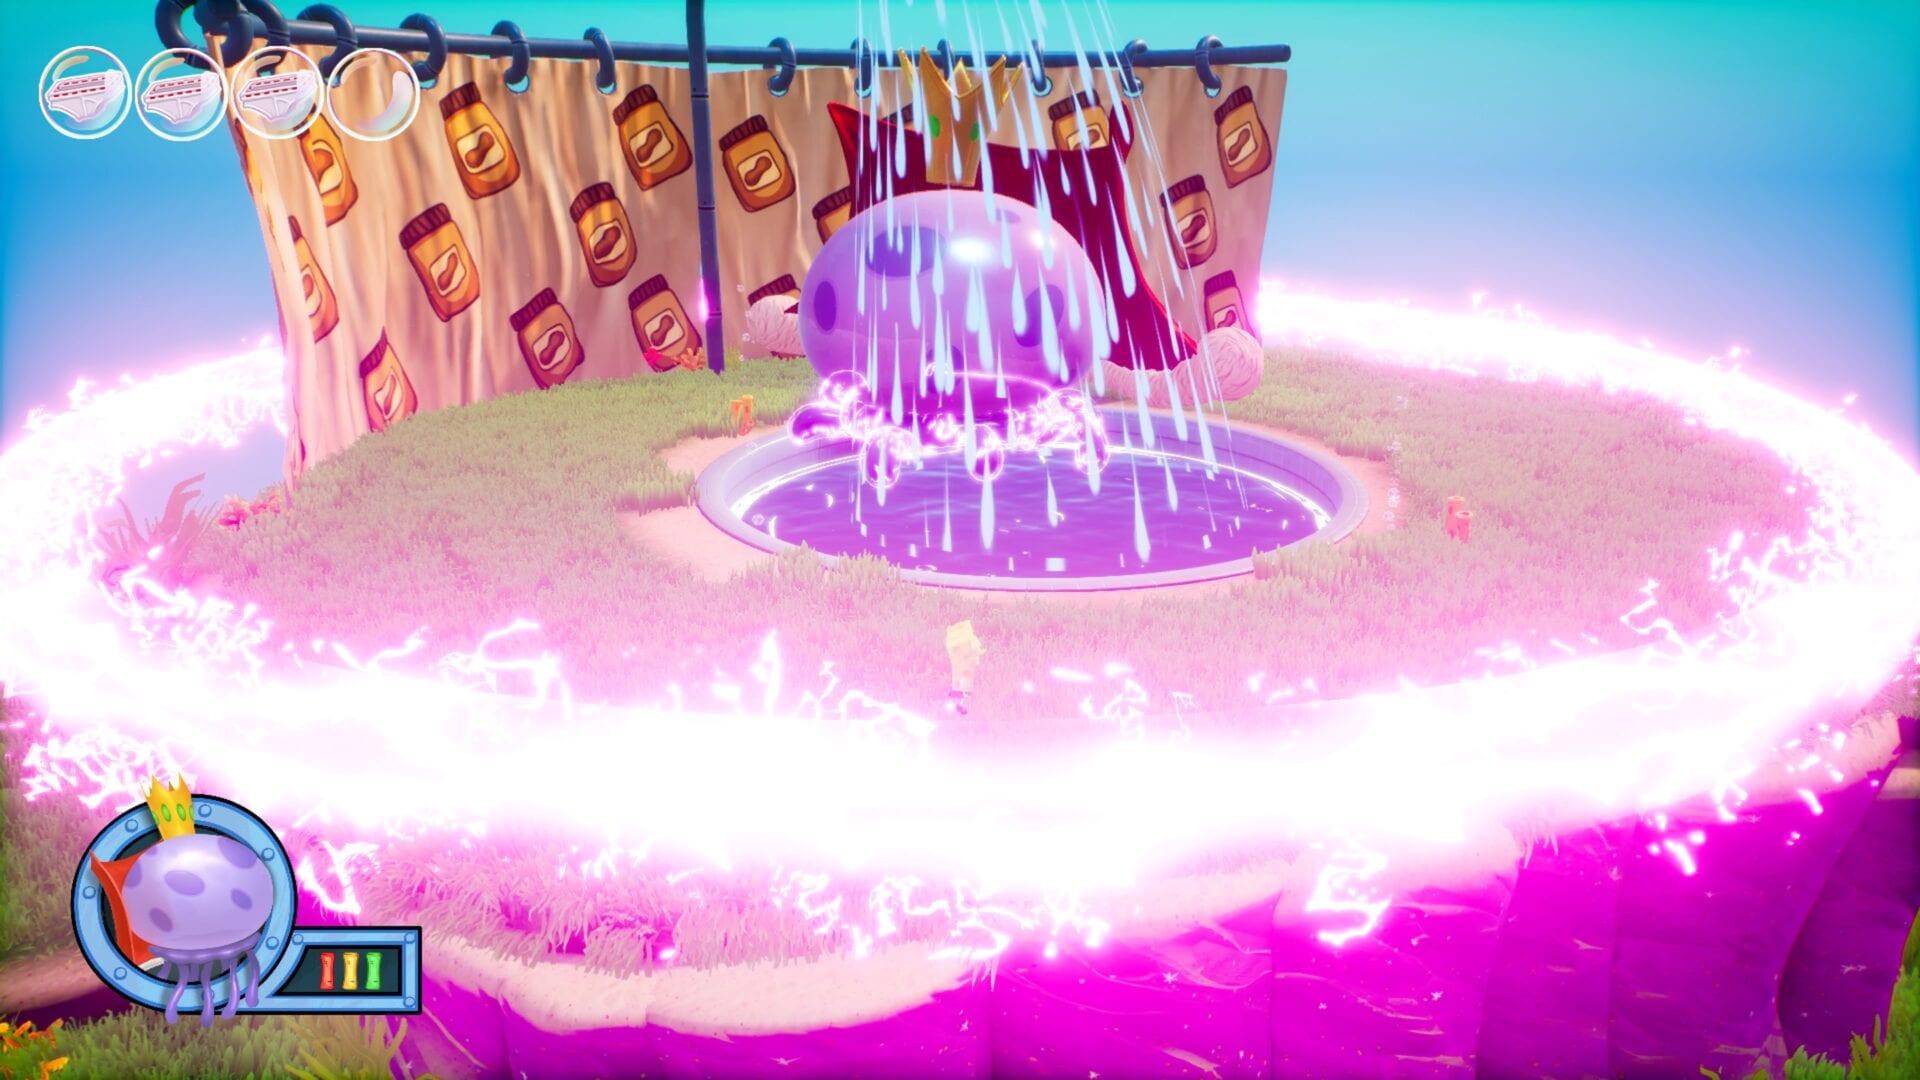 batalla por la parte inferior del bikini, la medusa real